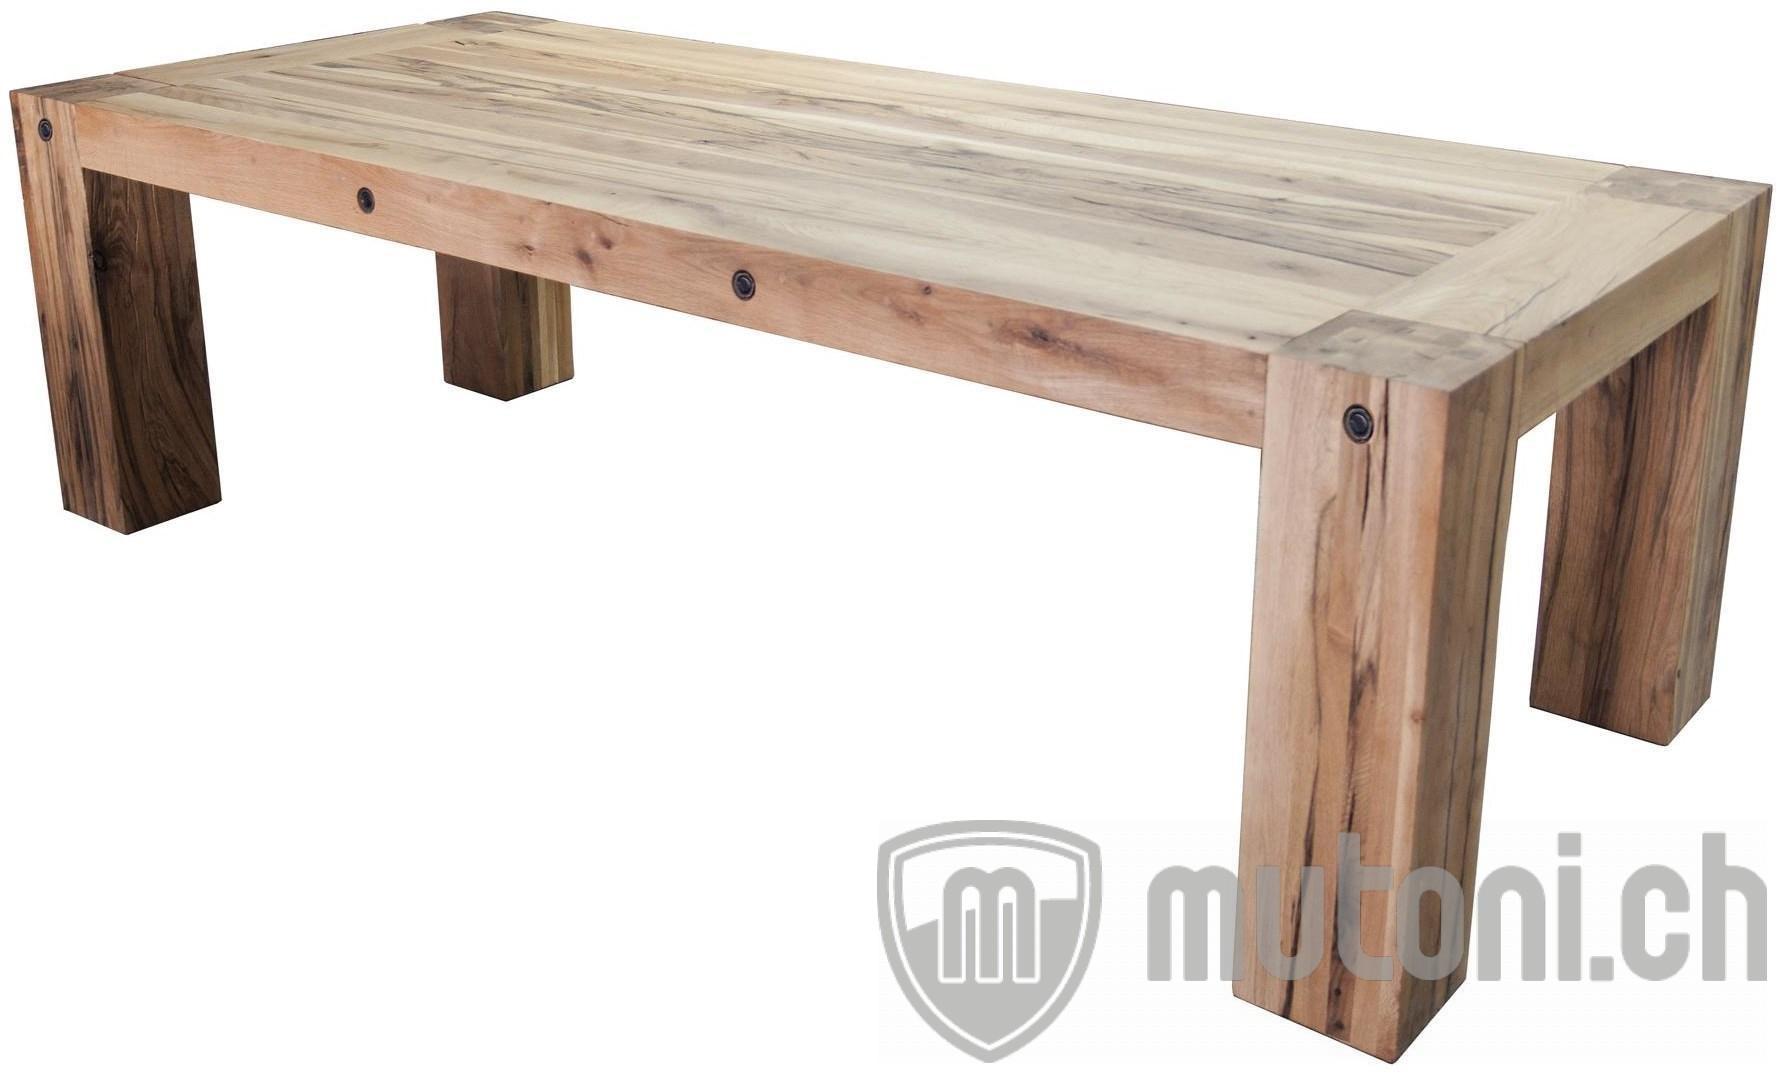 esstisch ontario eiche rustikal mutoni wood mutoni m bel. Black Bedroom Furniture Sets. Home Design Ideas